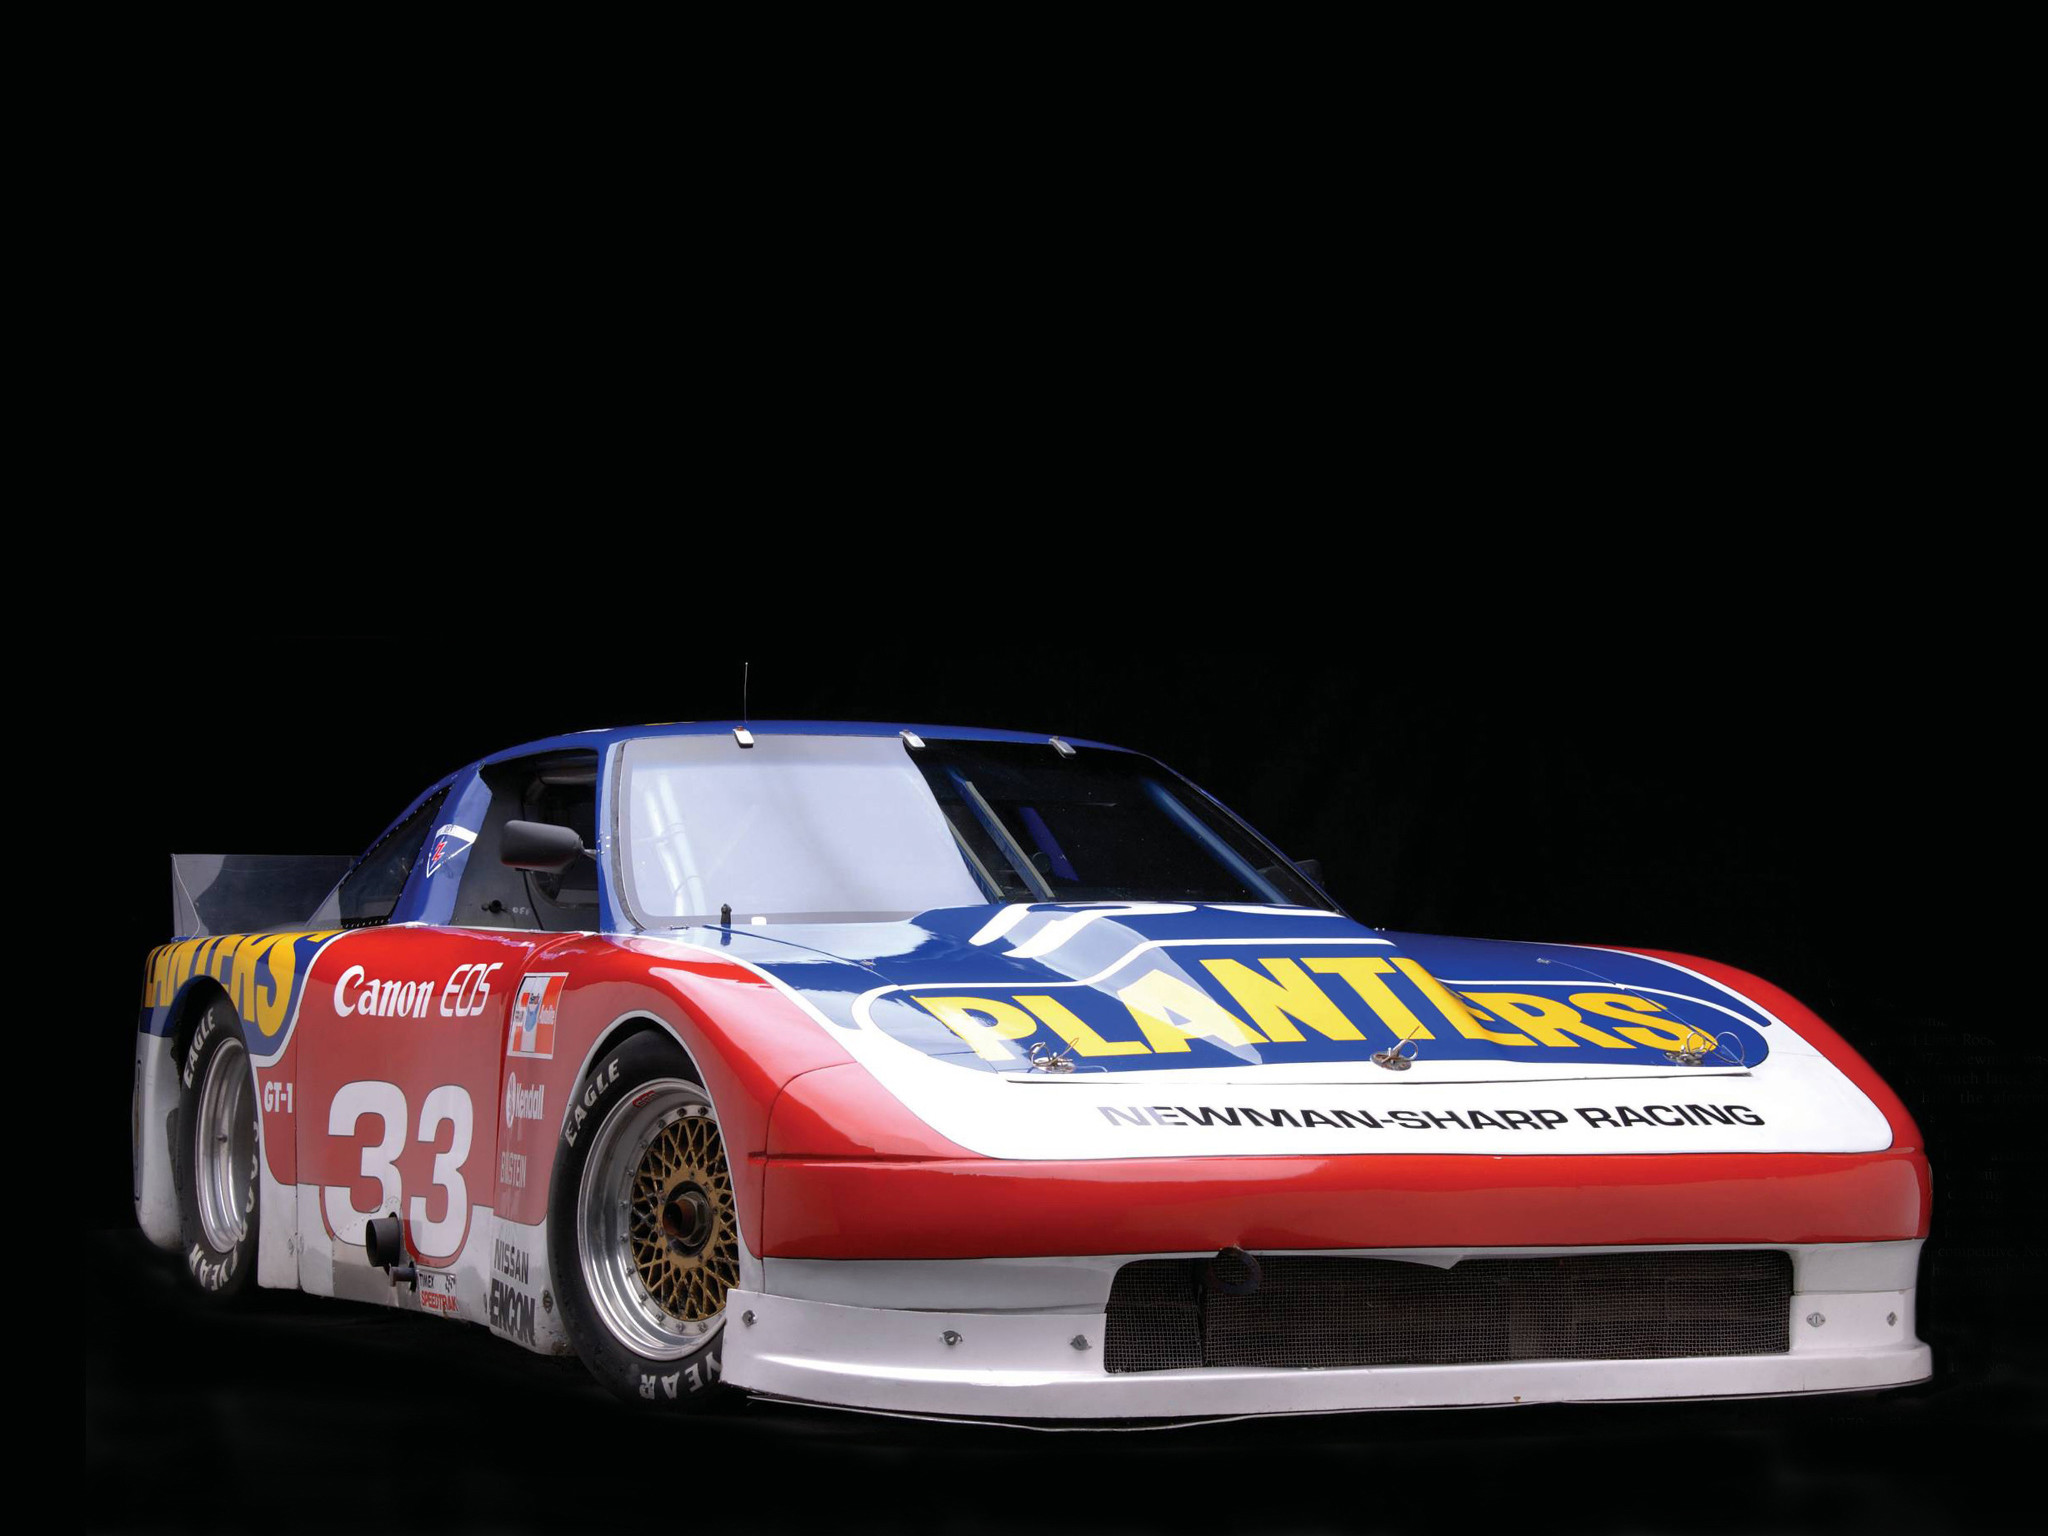 1986 Nissan 300ZX Turbo IMSA GTO Z31 racing race classic f wallpaper |  | 117993 | WallpaperUP